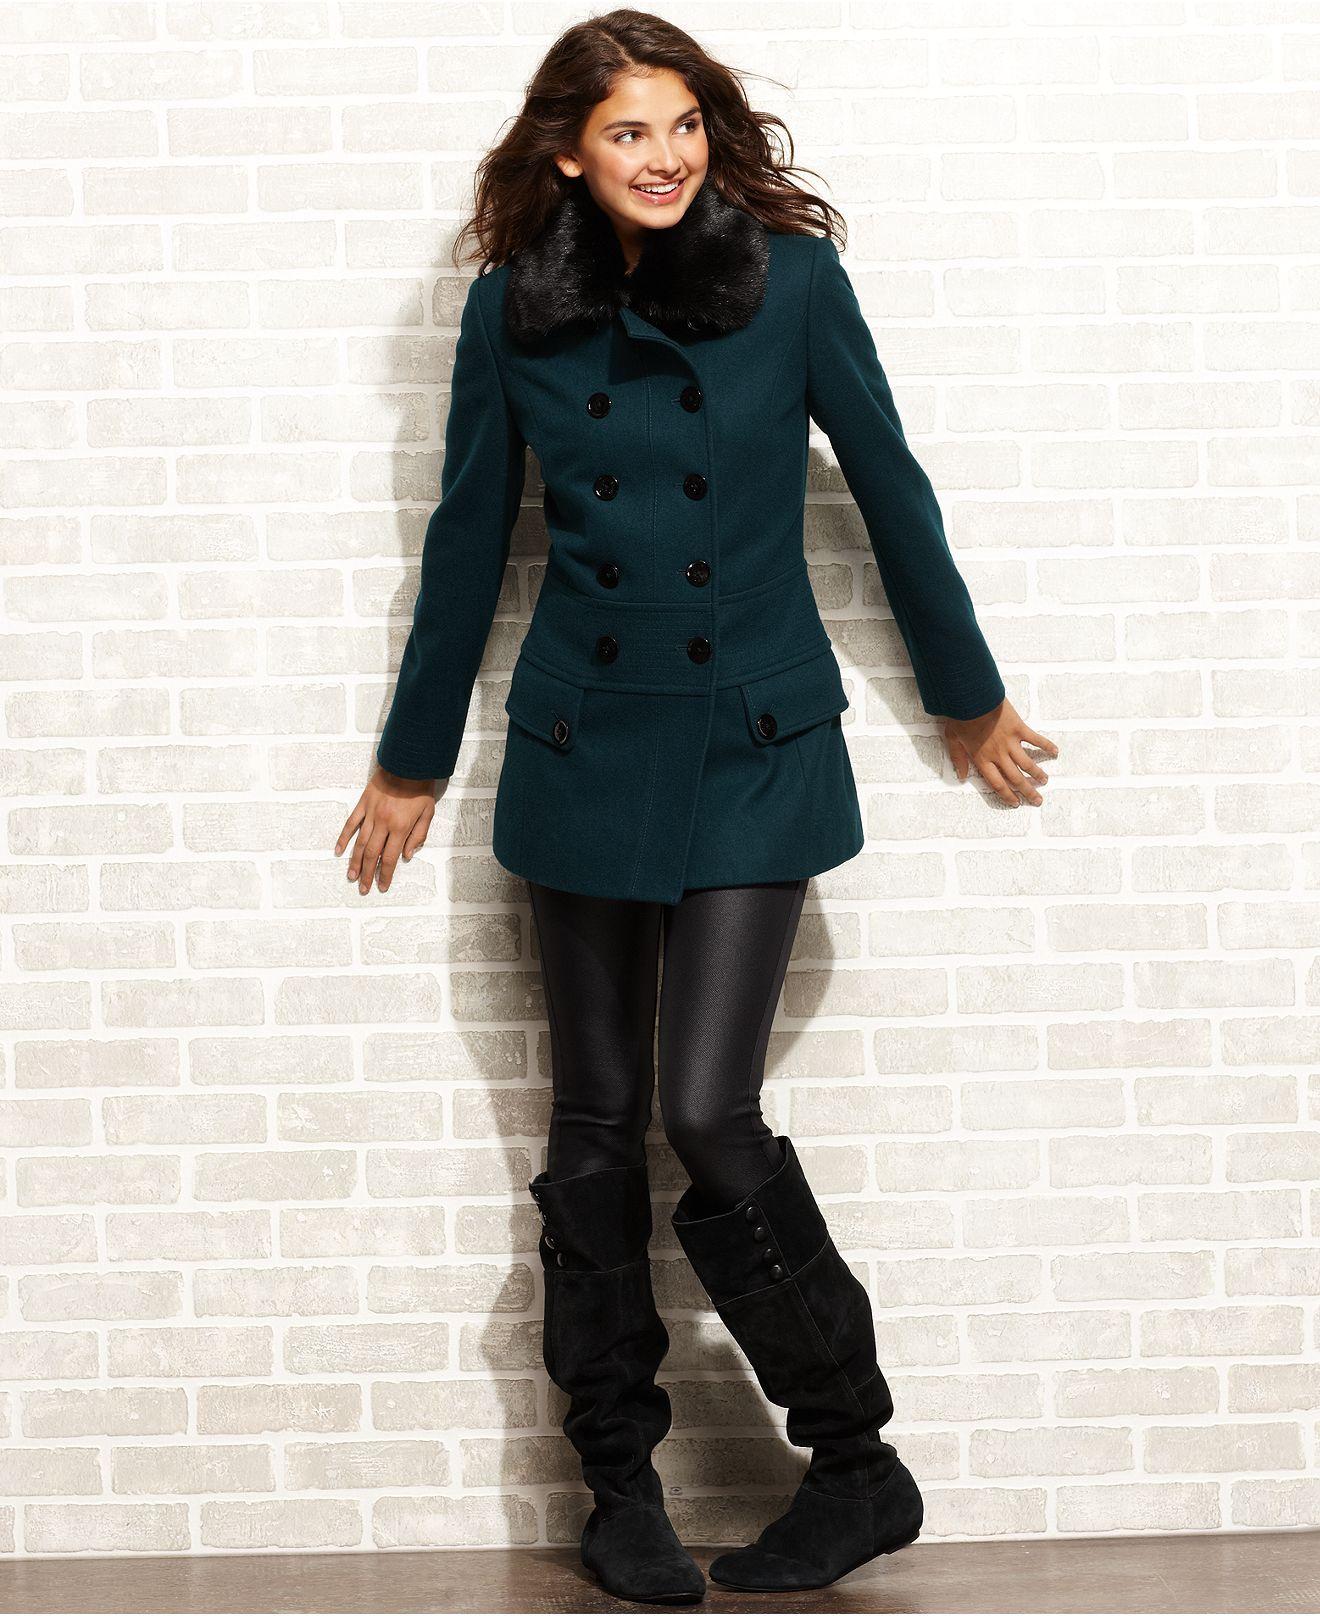 Esprit Coat Wool Blend Faux Fur Collar Double Breasted 159 99 Coats For Women Trench Coats Women Faux Fur Collar [ 1616 x 1320 Pixel ]